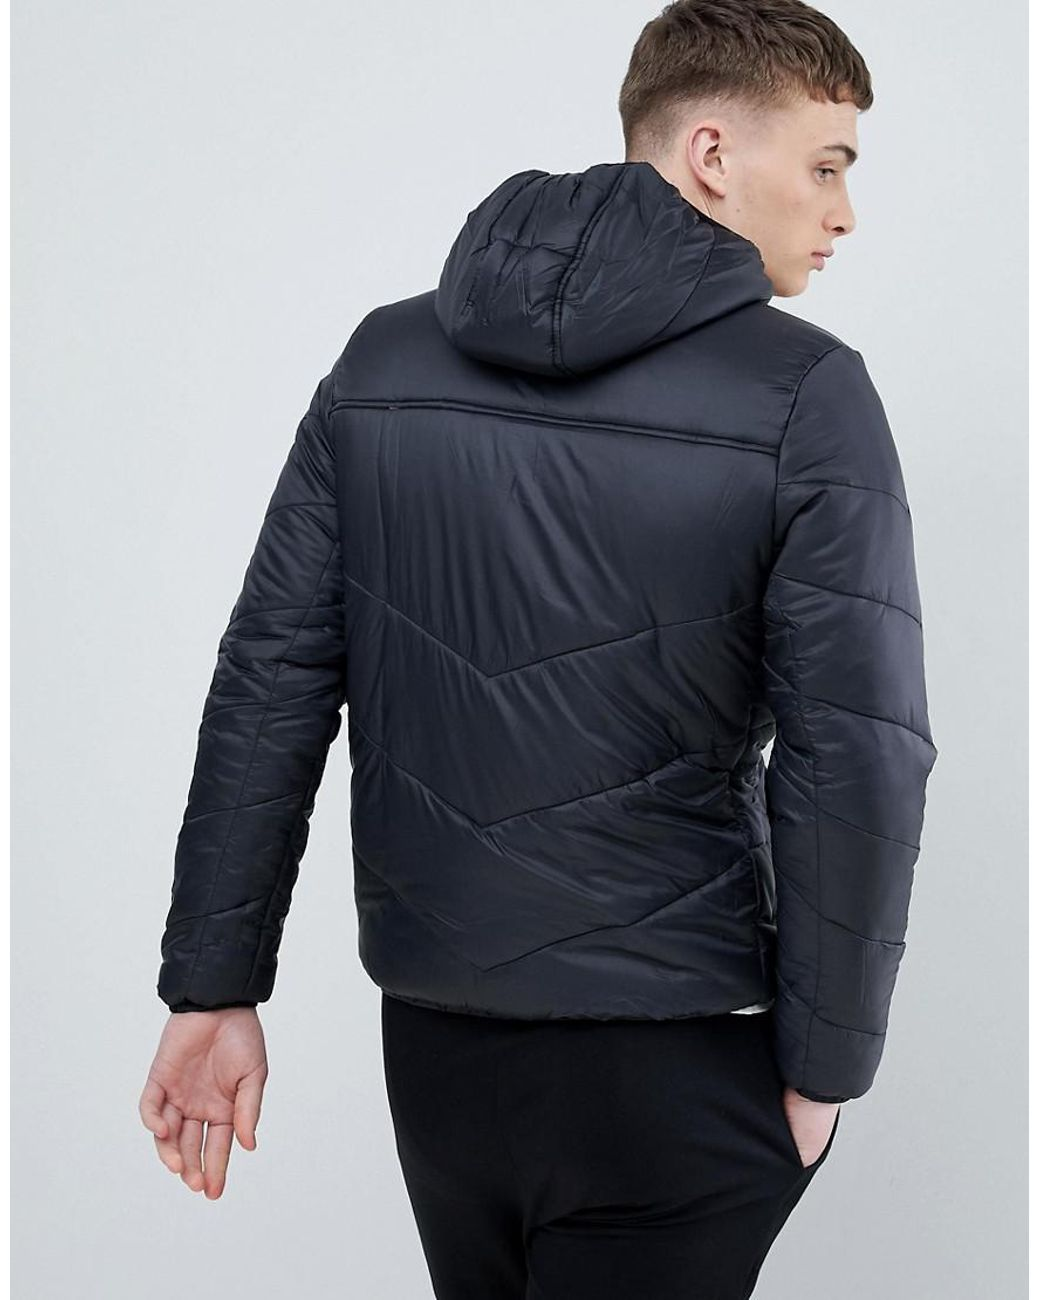 d11d3d04e Kappa Padded Jacket With Hood Branding in Black for Men - Lyst